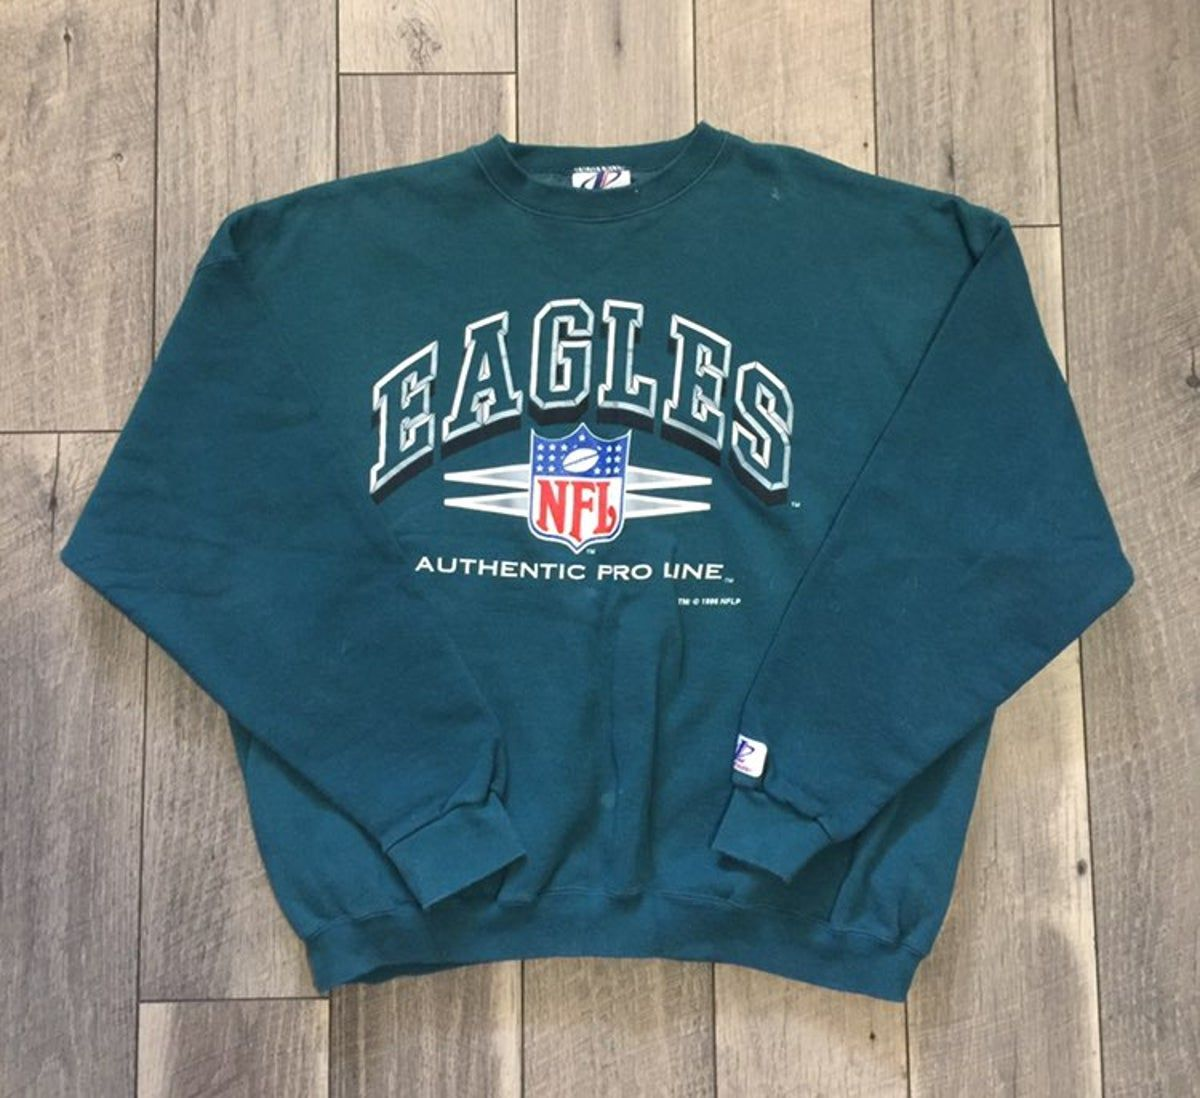 Vintage Philadelphia Eagles Sweatshirt In 2021 Sweatshirts Eagles Sweatshirt Vintage Sweatshirt [ 1098 x 1200 Pixel ]